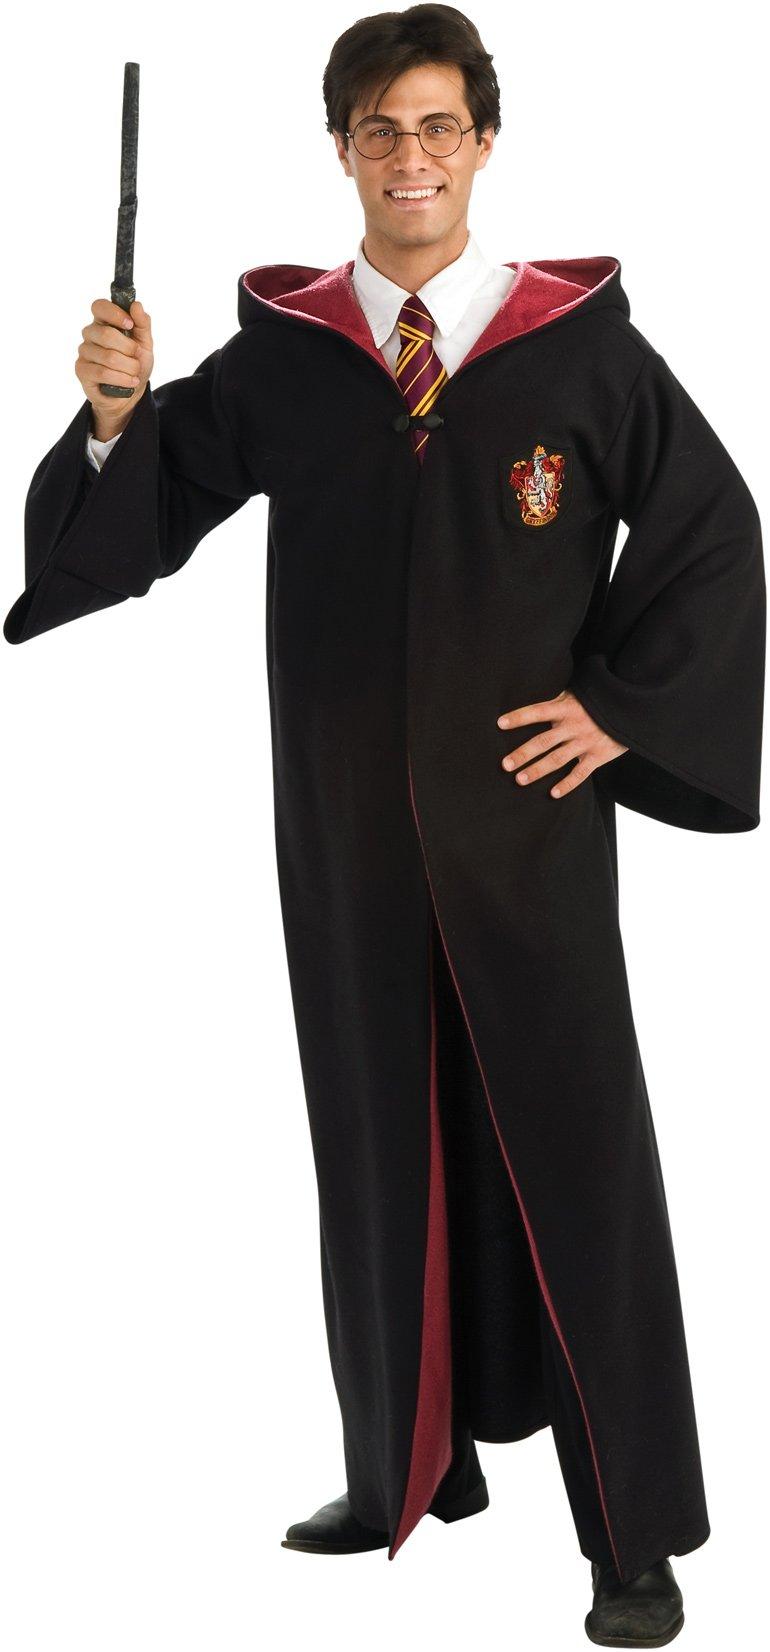 Harry Potter Deluxe Robe Adult Costume 69223 Trisha Krishnan Bollywood Actress